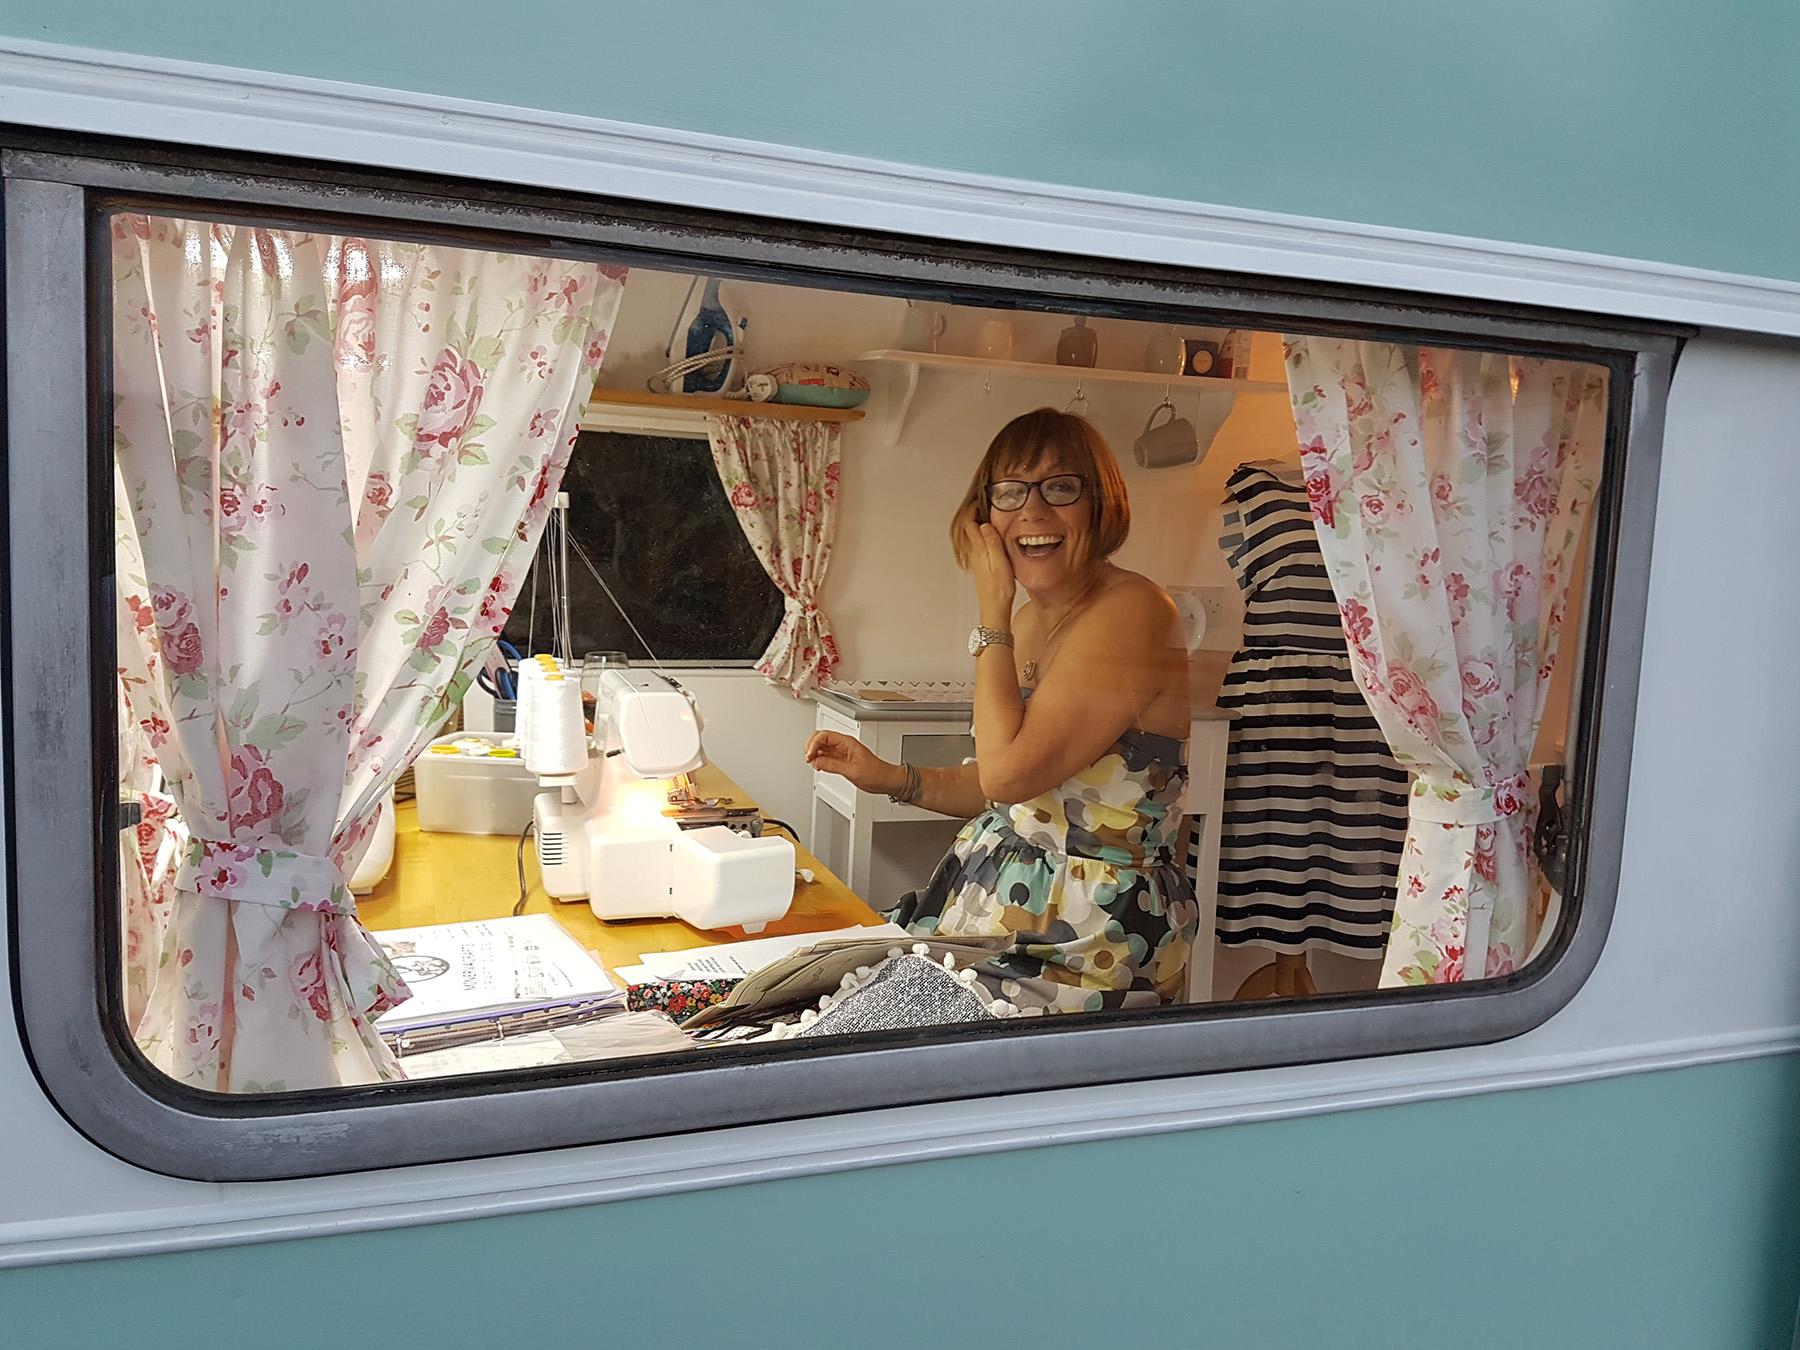 Sewing Room Ideas - Michaela\'s Sewing Caravan! - Makerist